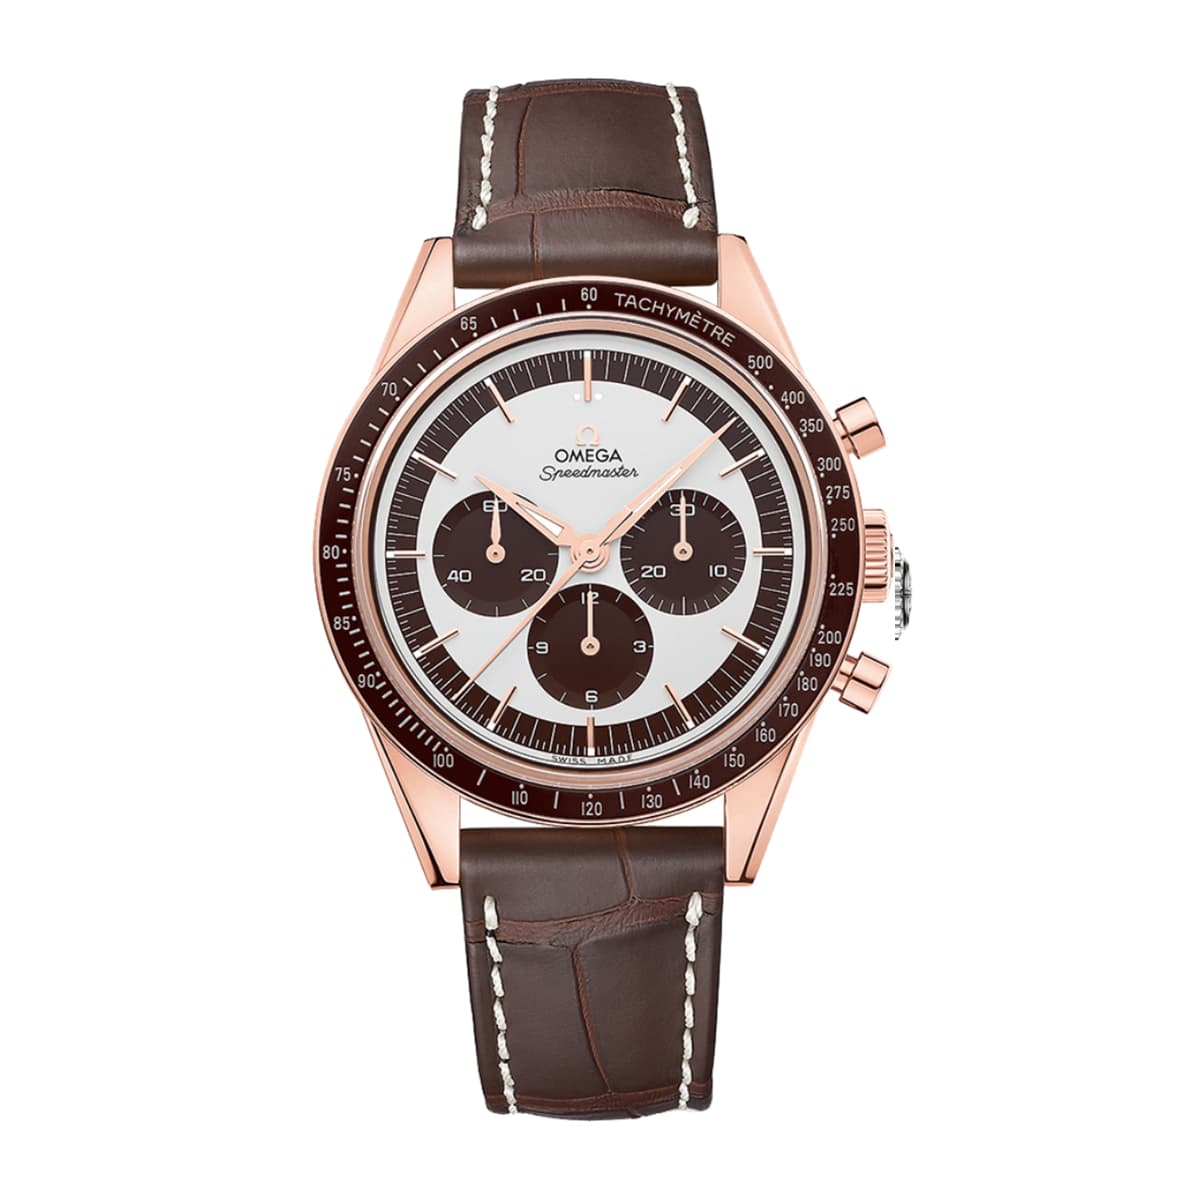 Omega Speedmaster 40 Chronograph